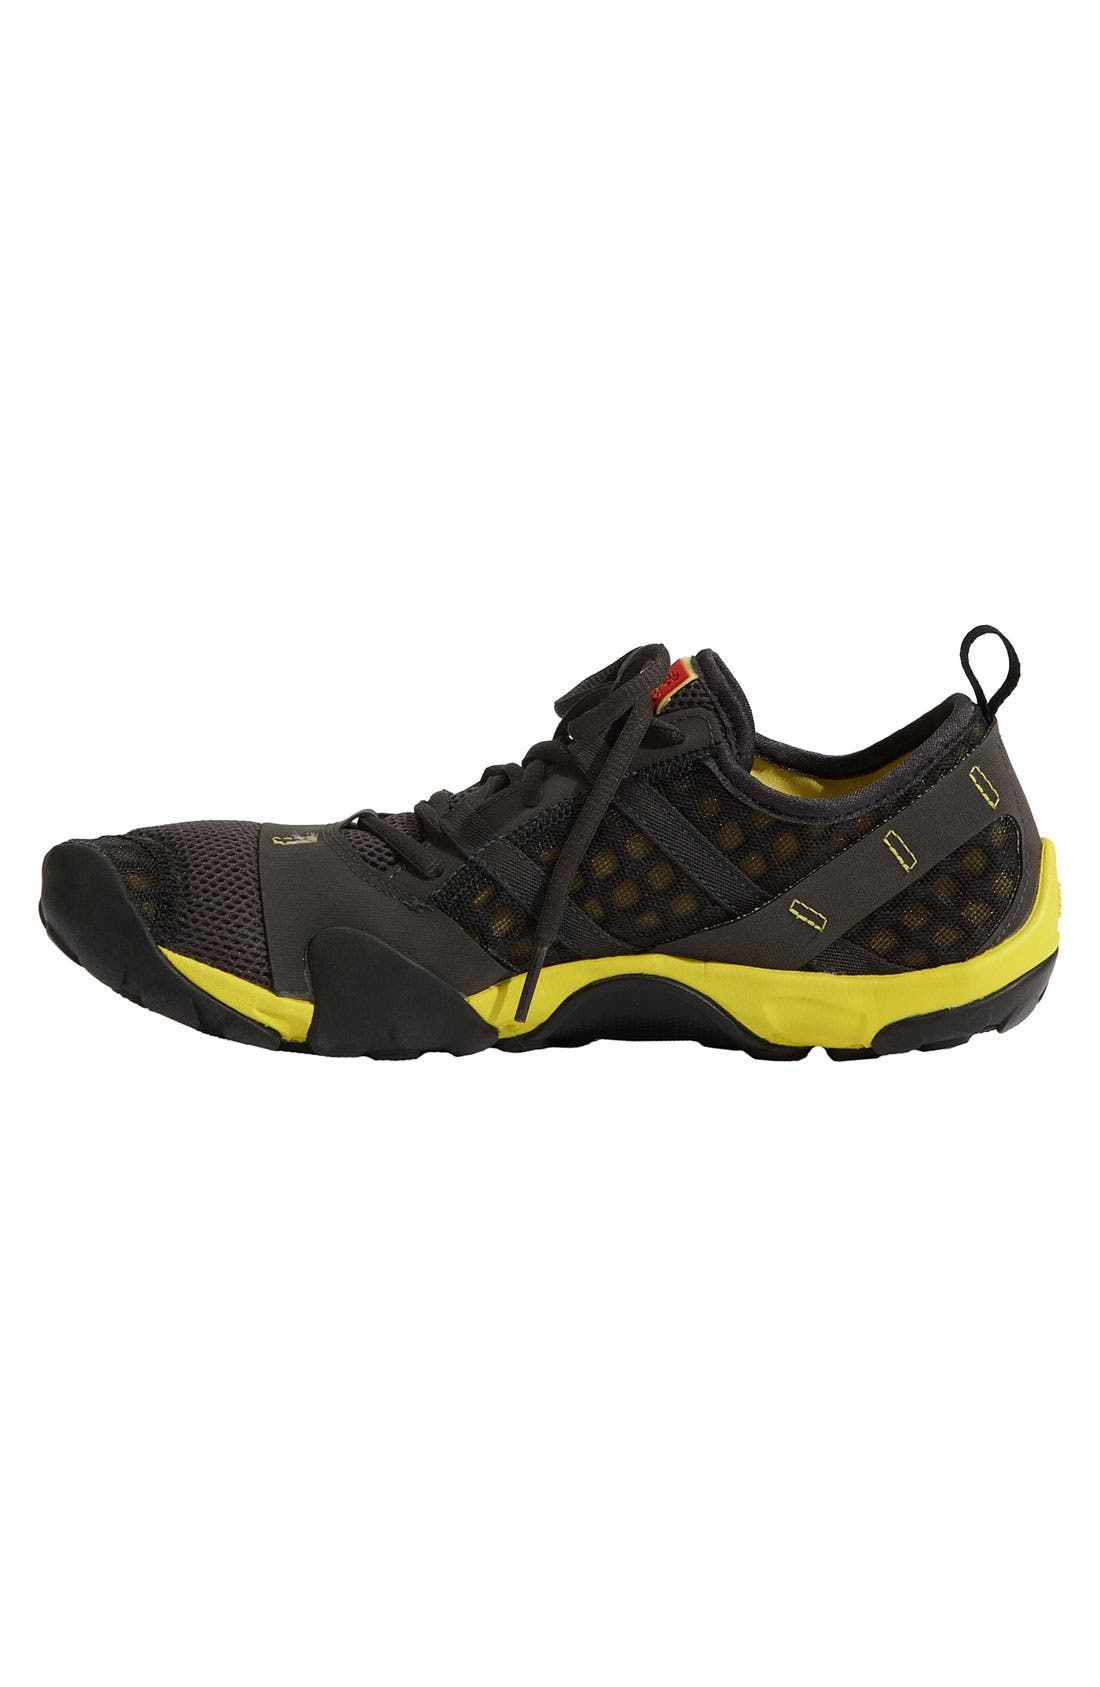 NEW BALANCE, 'Minimus' Trail Running Shoe, Alternate thumbnail 3, color, 030